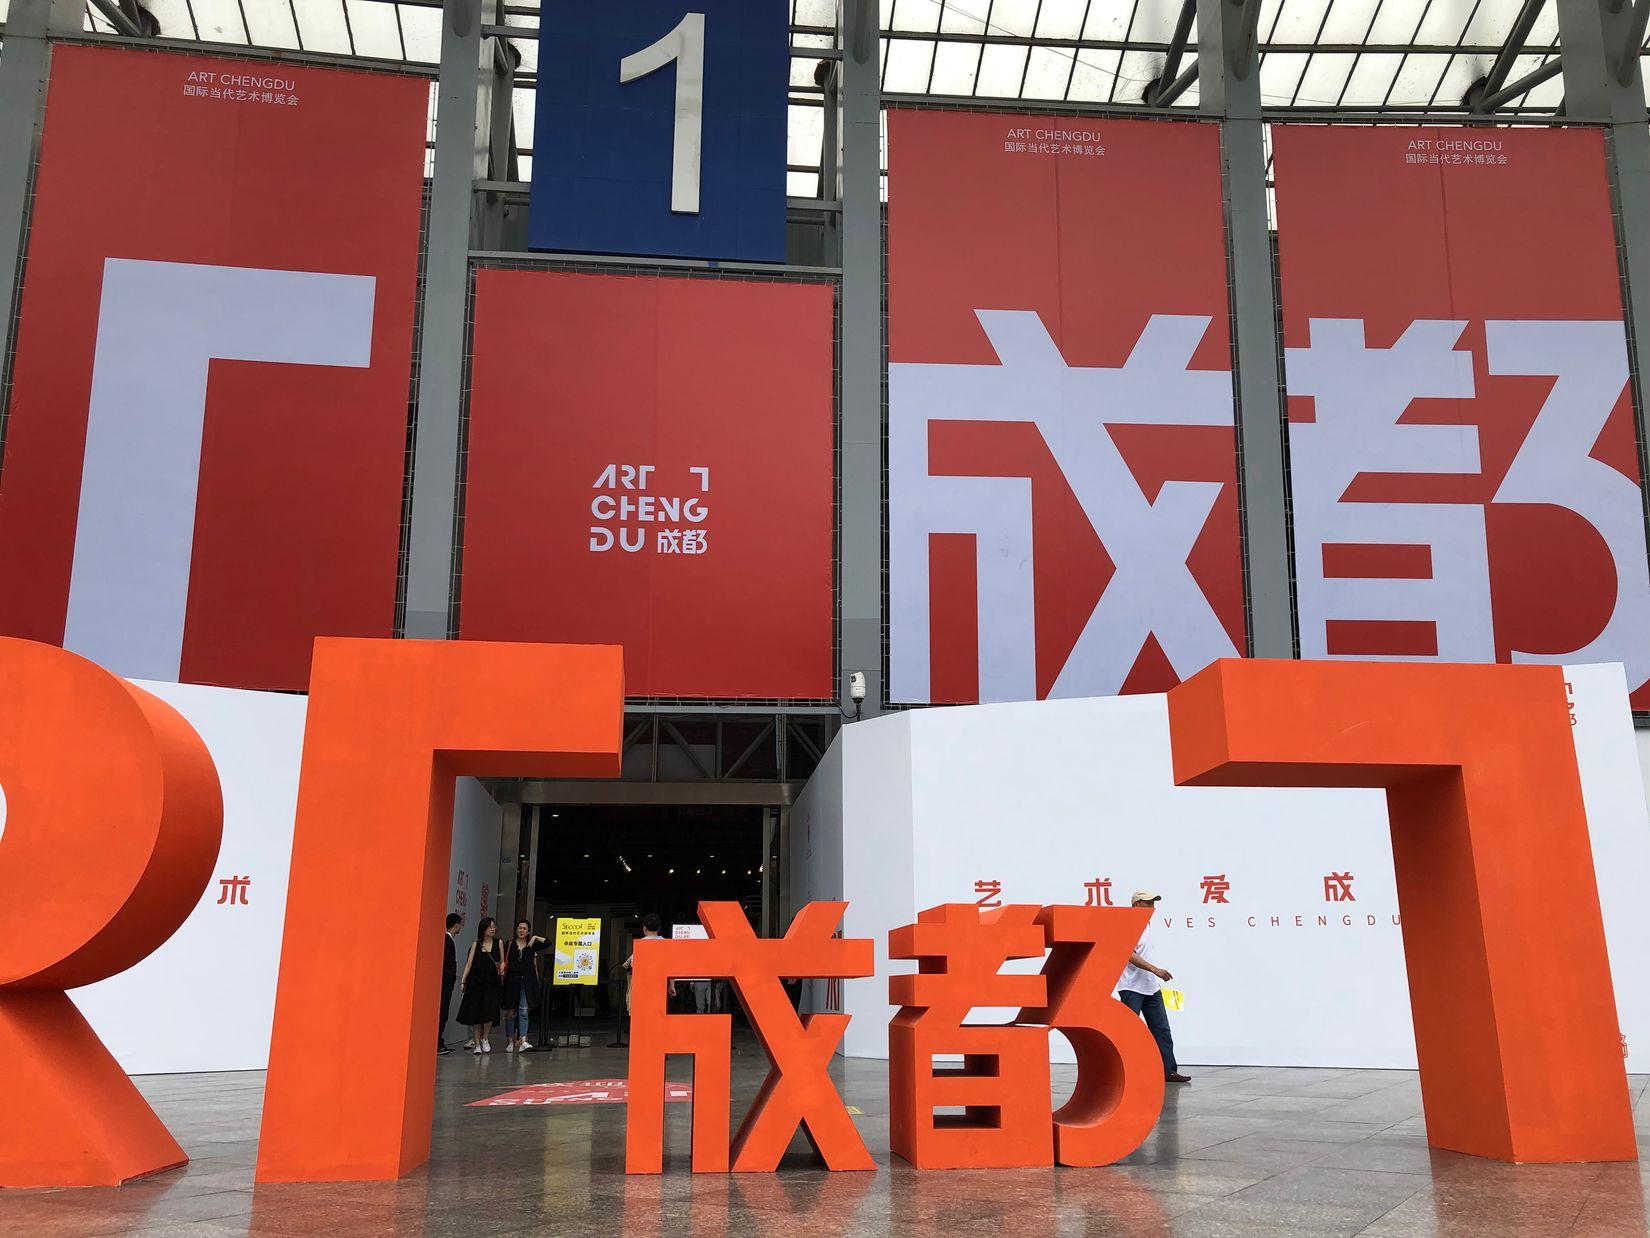 Highlights from Art Chengdu 2019!